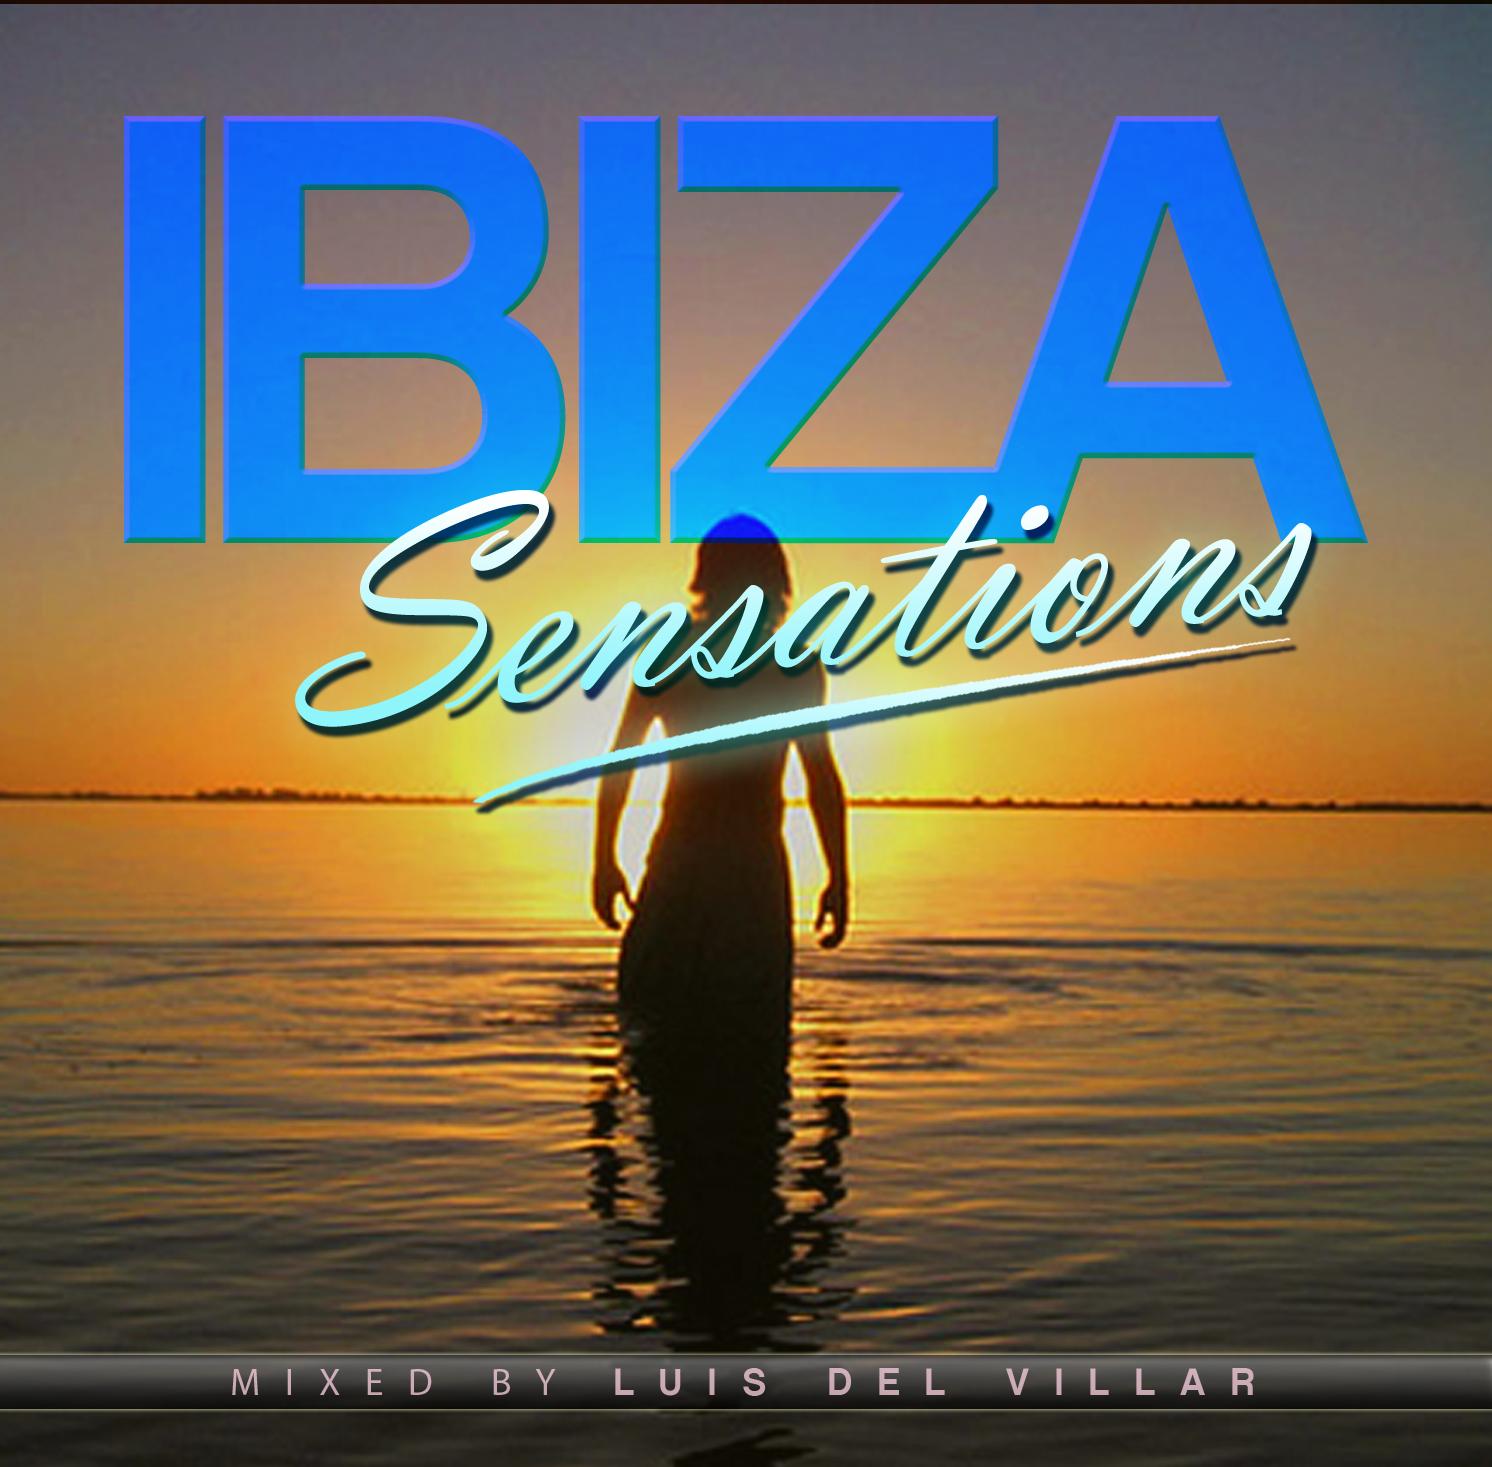 Artwork for Ibiza Sensations 53